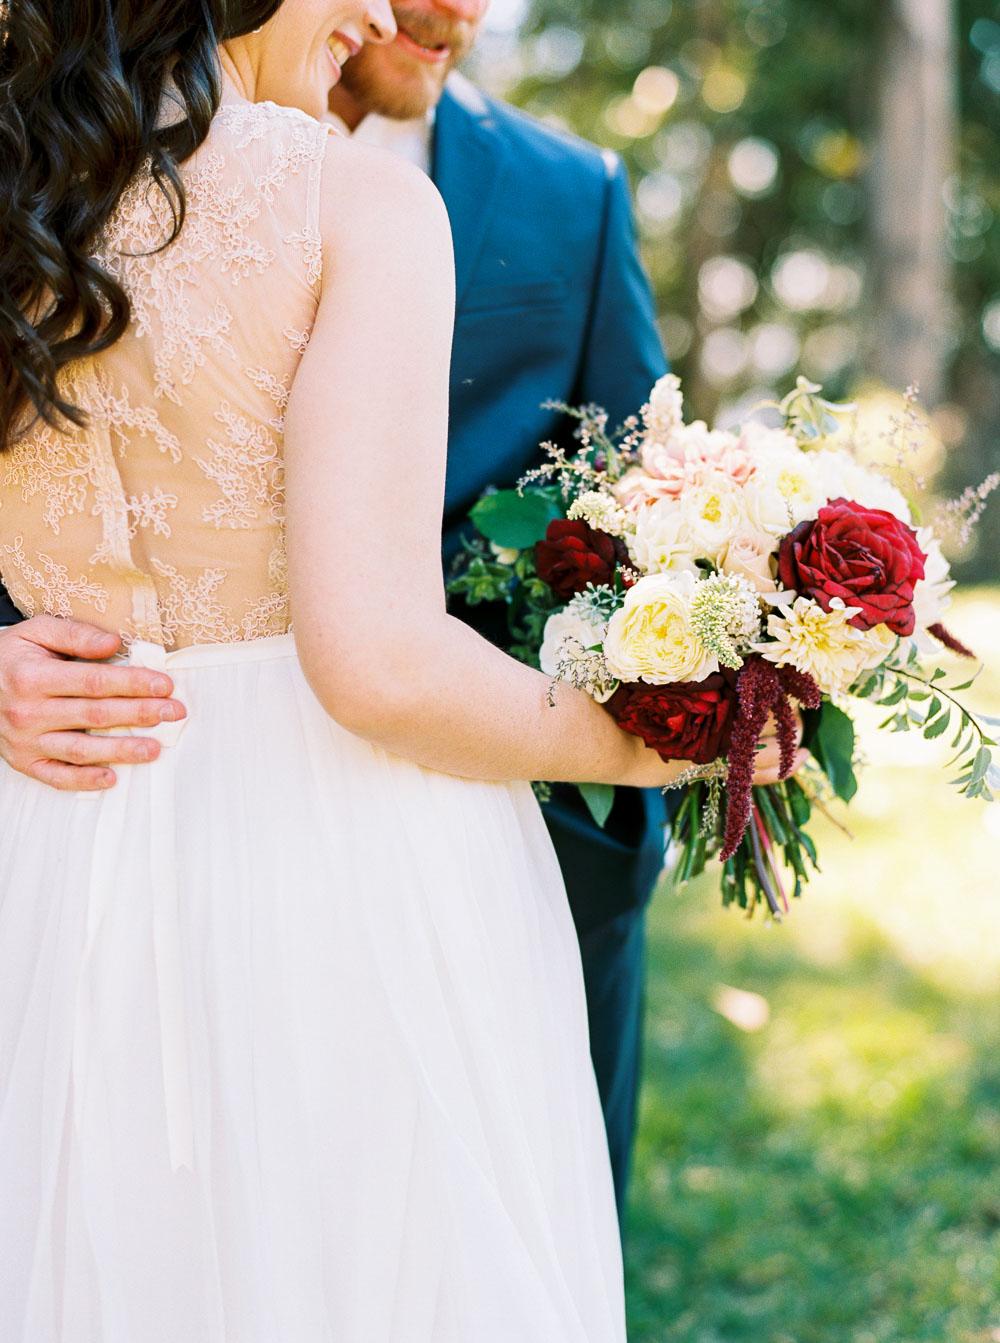 1 Big+Sur+wedding+photographer-64.jpg